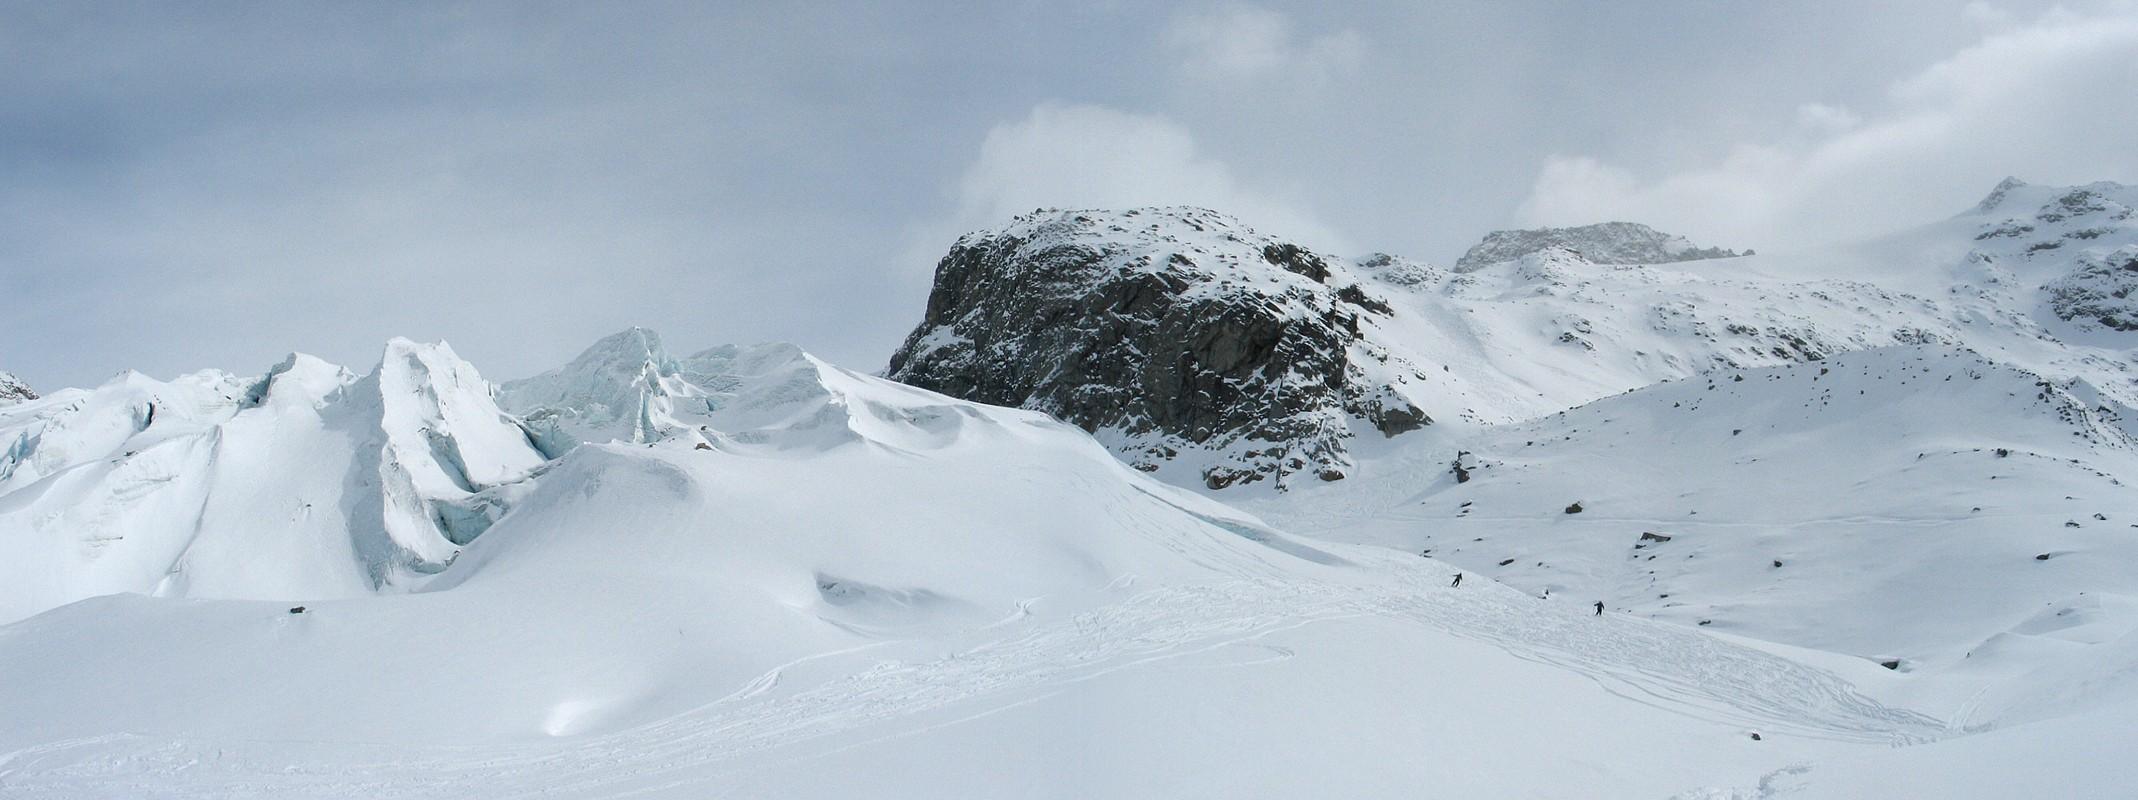 Morteratsch Glacier freetour Bernina Švýcarsko panorama 35